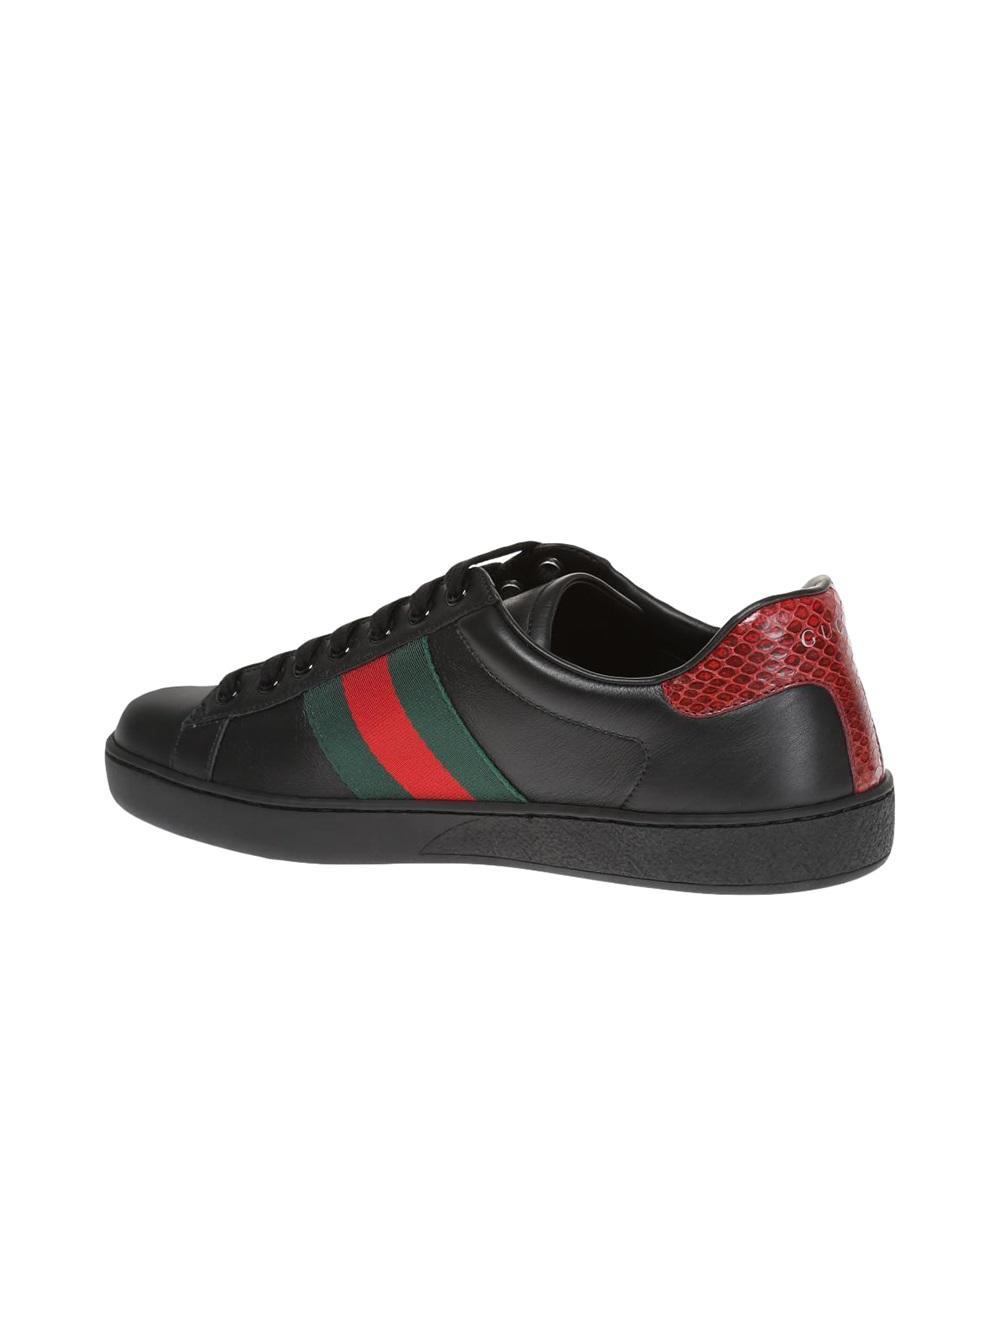 chaussure gucci authentique 04ac5b7aeb5f